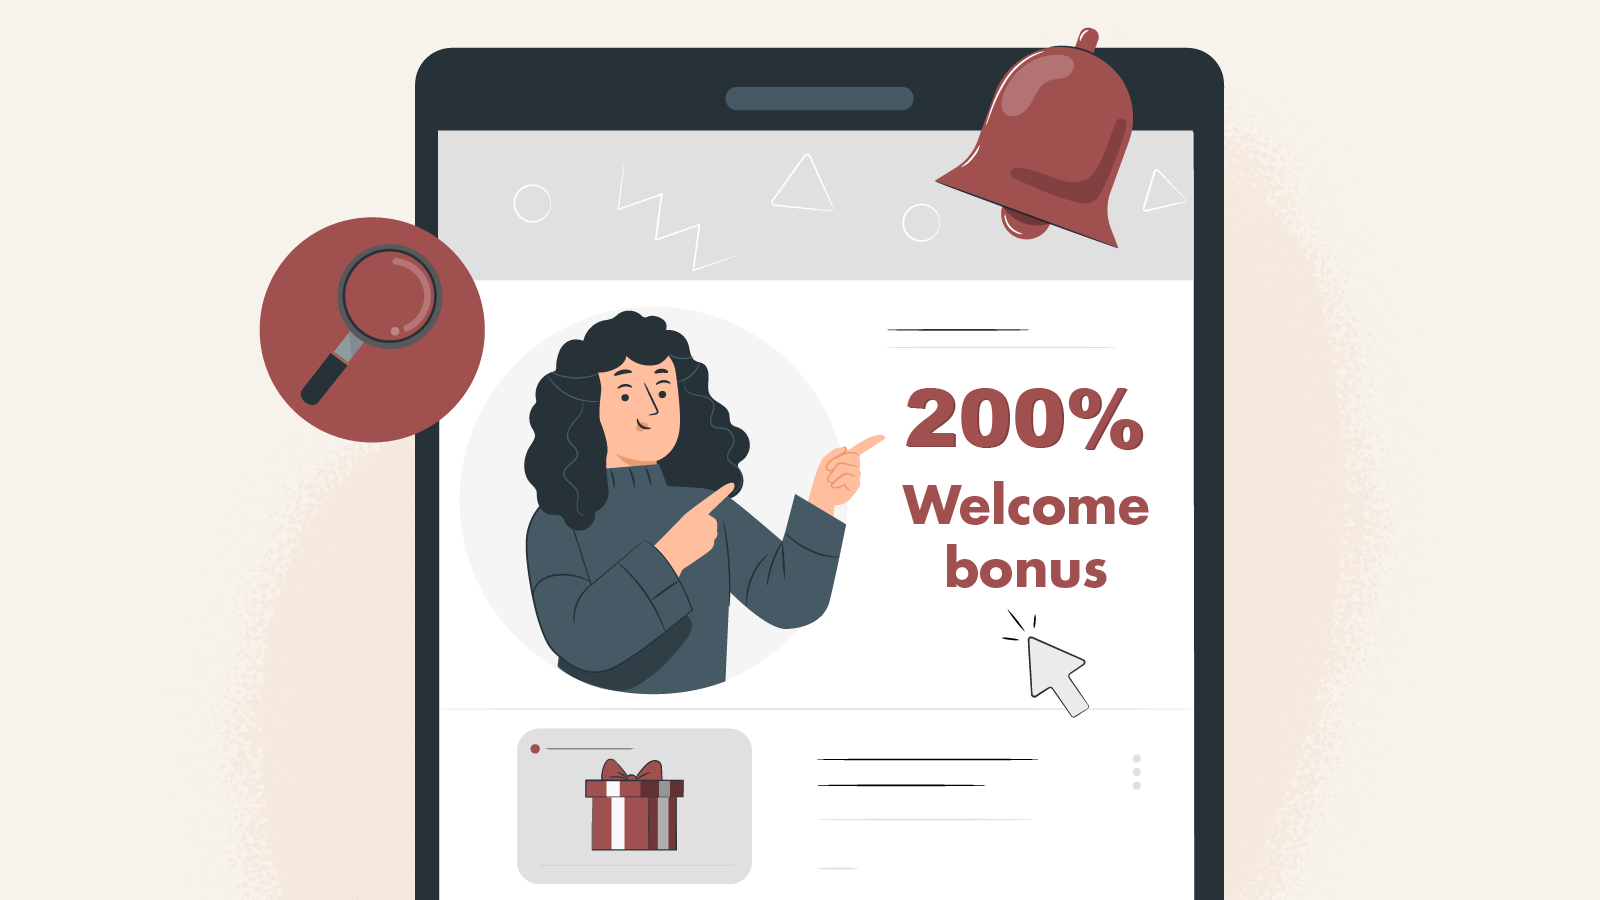 Choose your 200% welcome bonus Uk